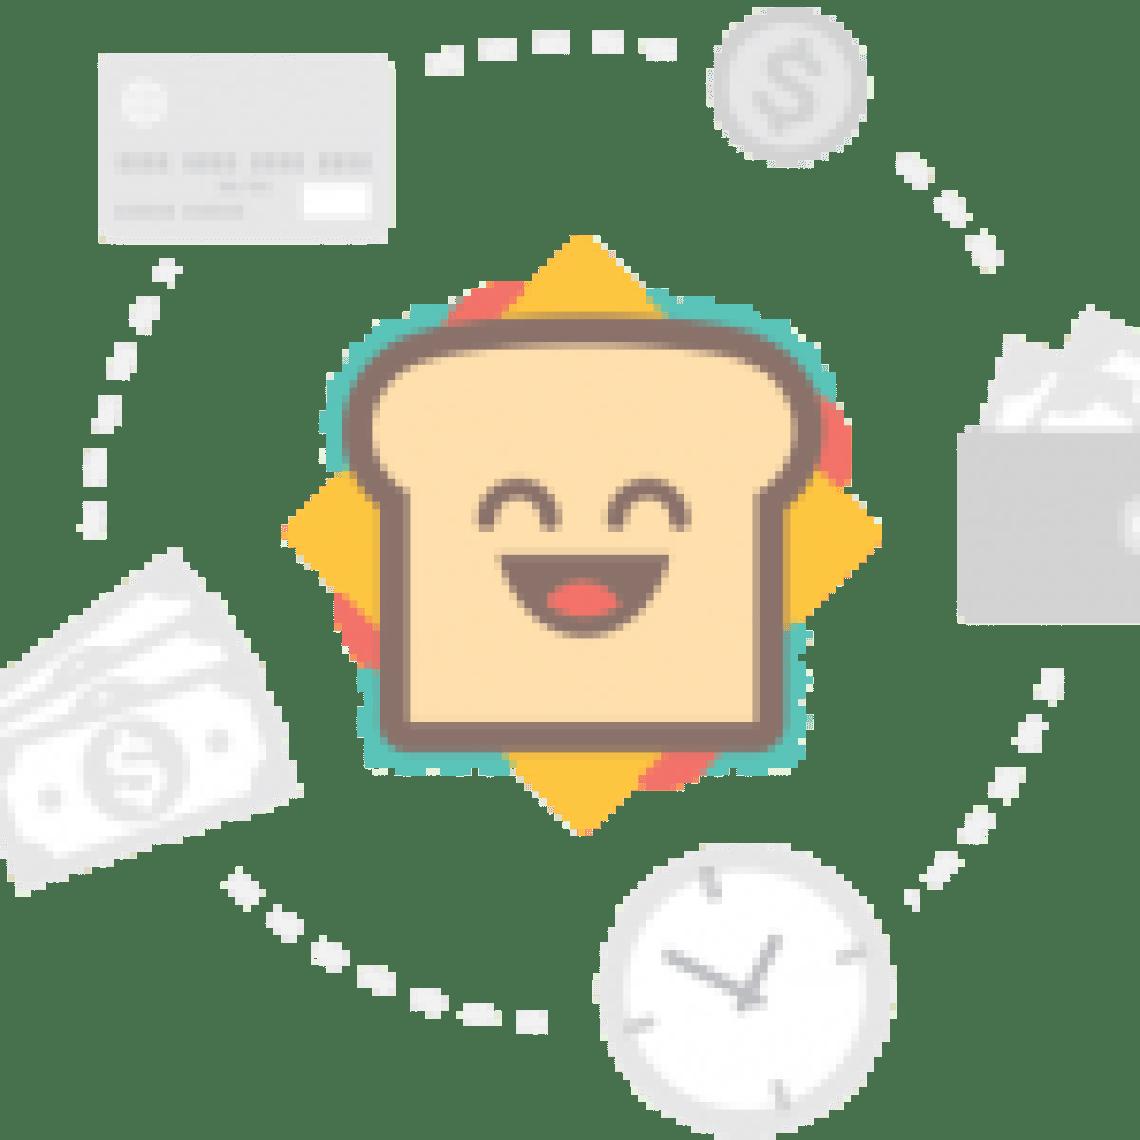 black hm dress new look bag tumblr fashion ootd vogue